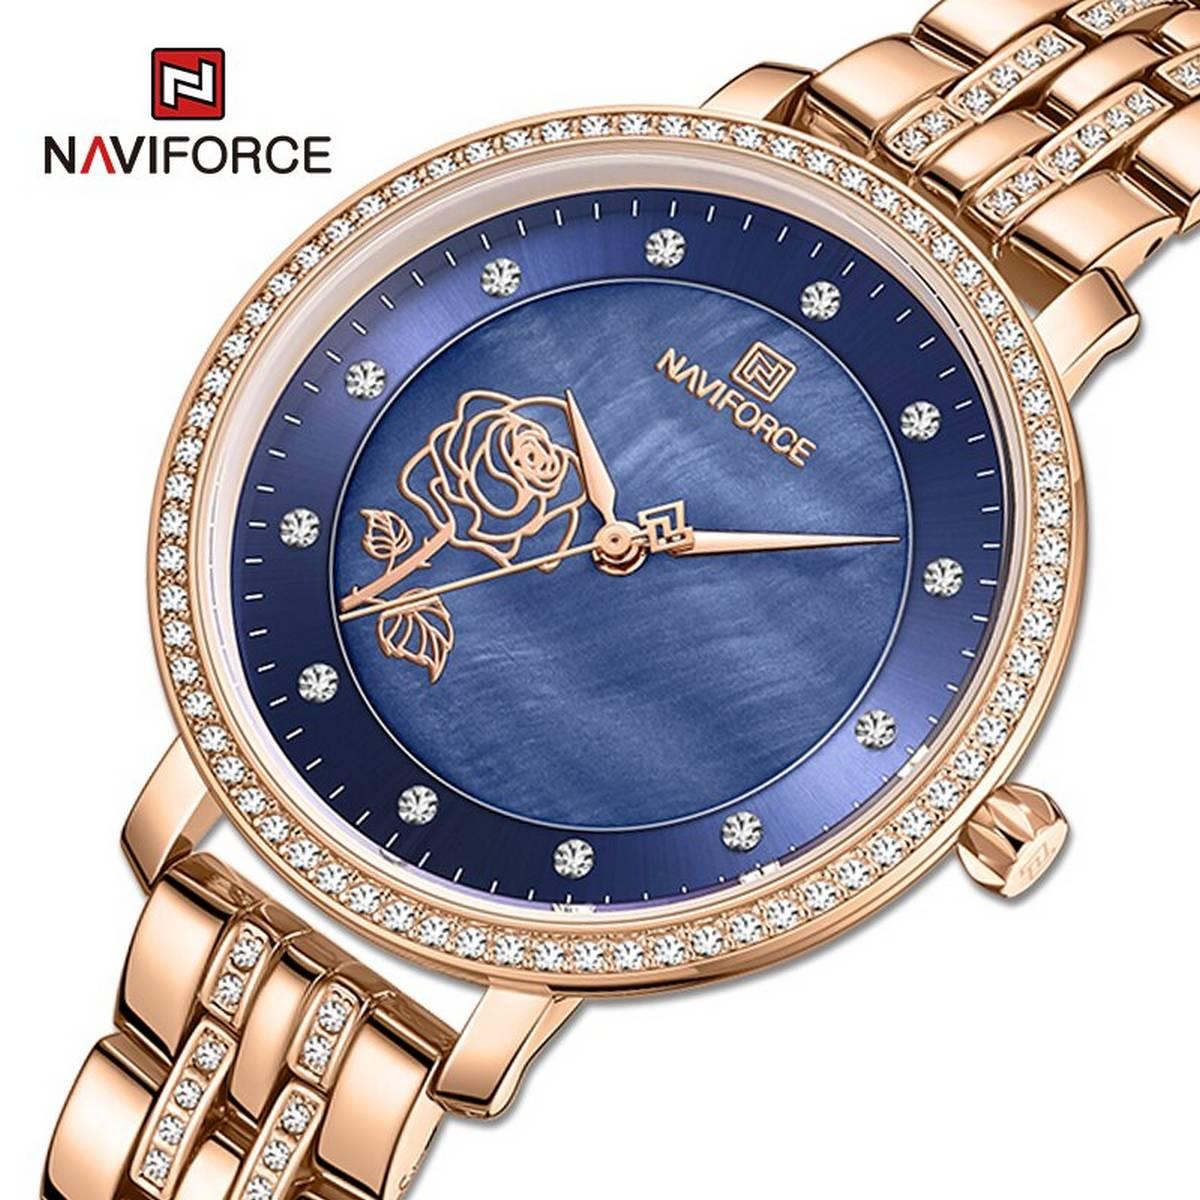 Naviforce Luxury Brand Female Fashion Quartz Stainless Steel Waterproof  Wrist Watch-NF5017